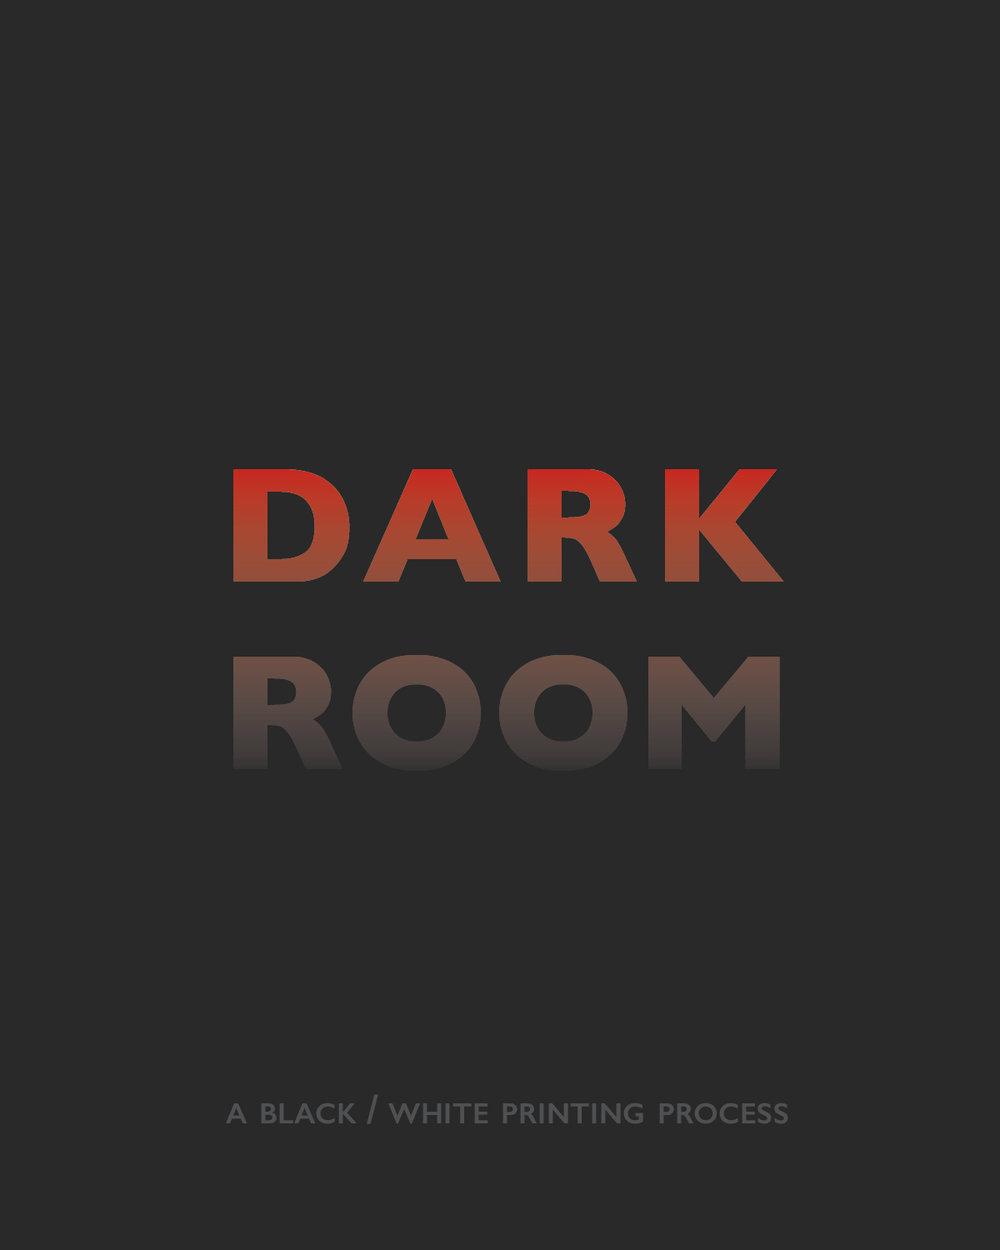 DARK-ROOM_Final-WEB.jpg